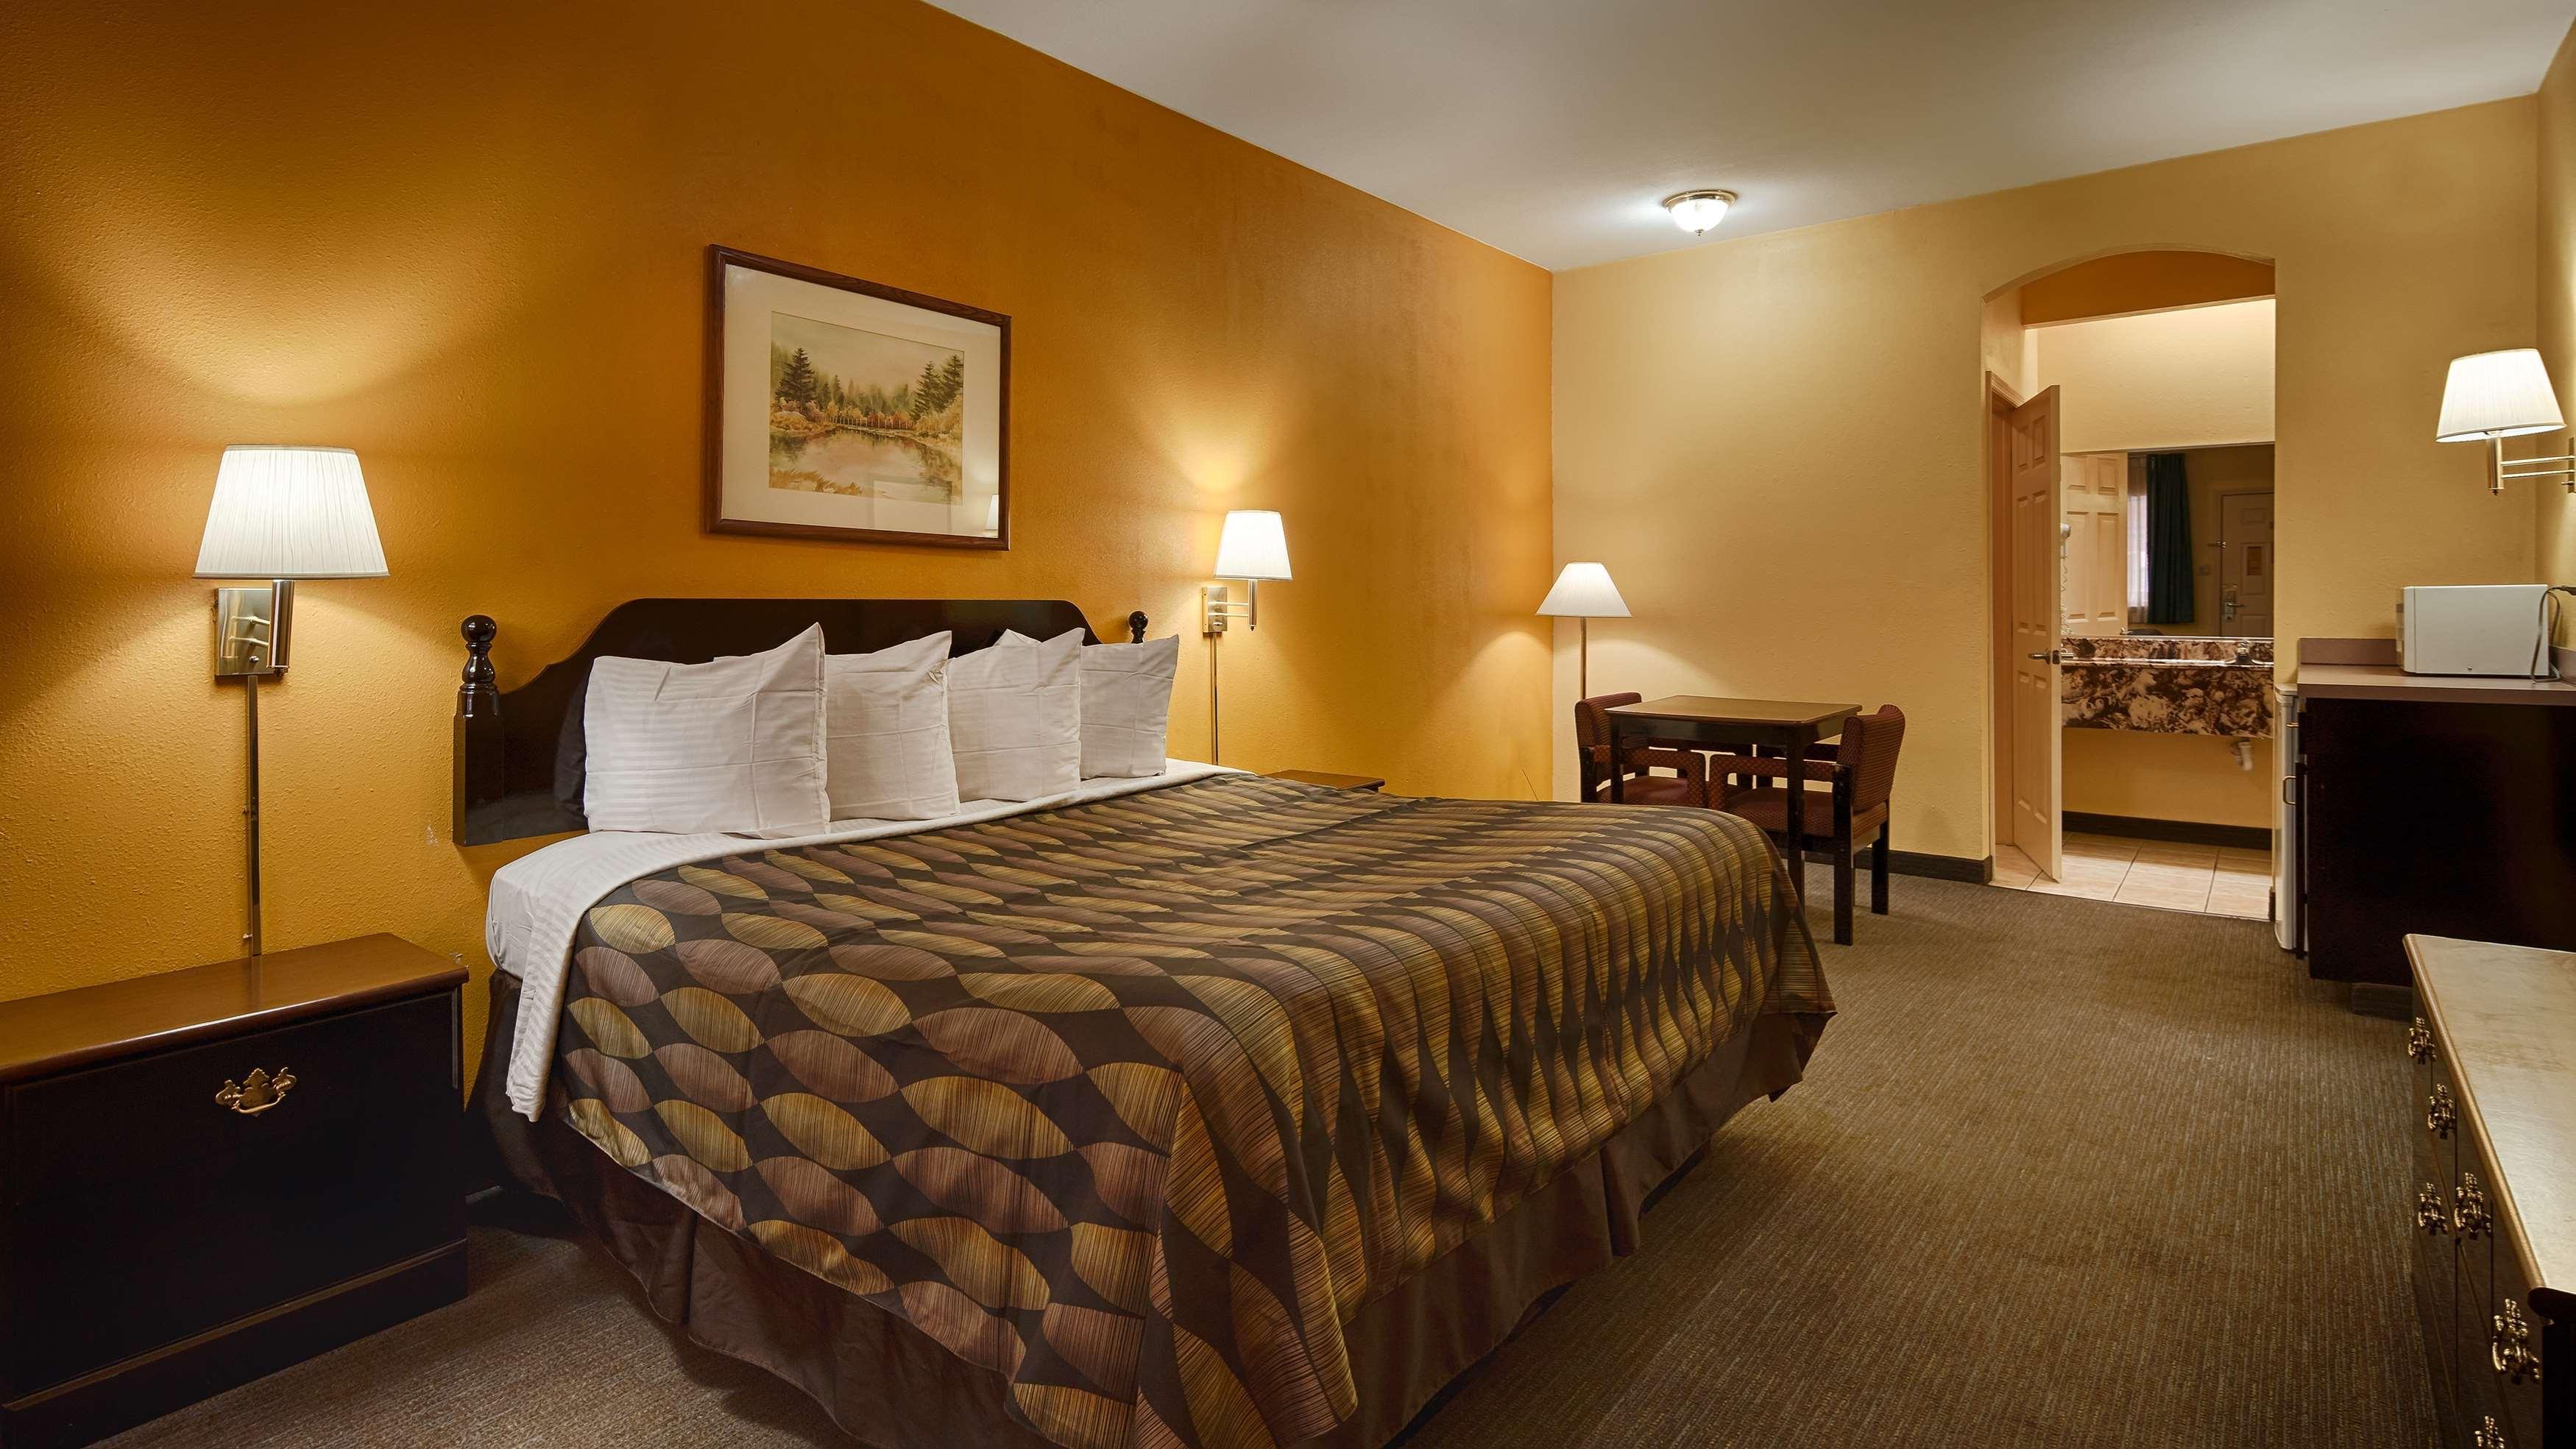 SureStay Hotel by Best Western Mission, Hidalgo